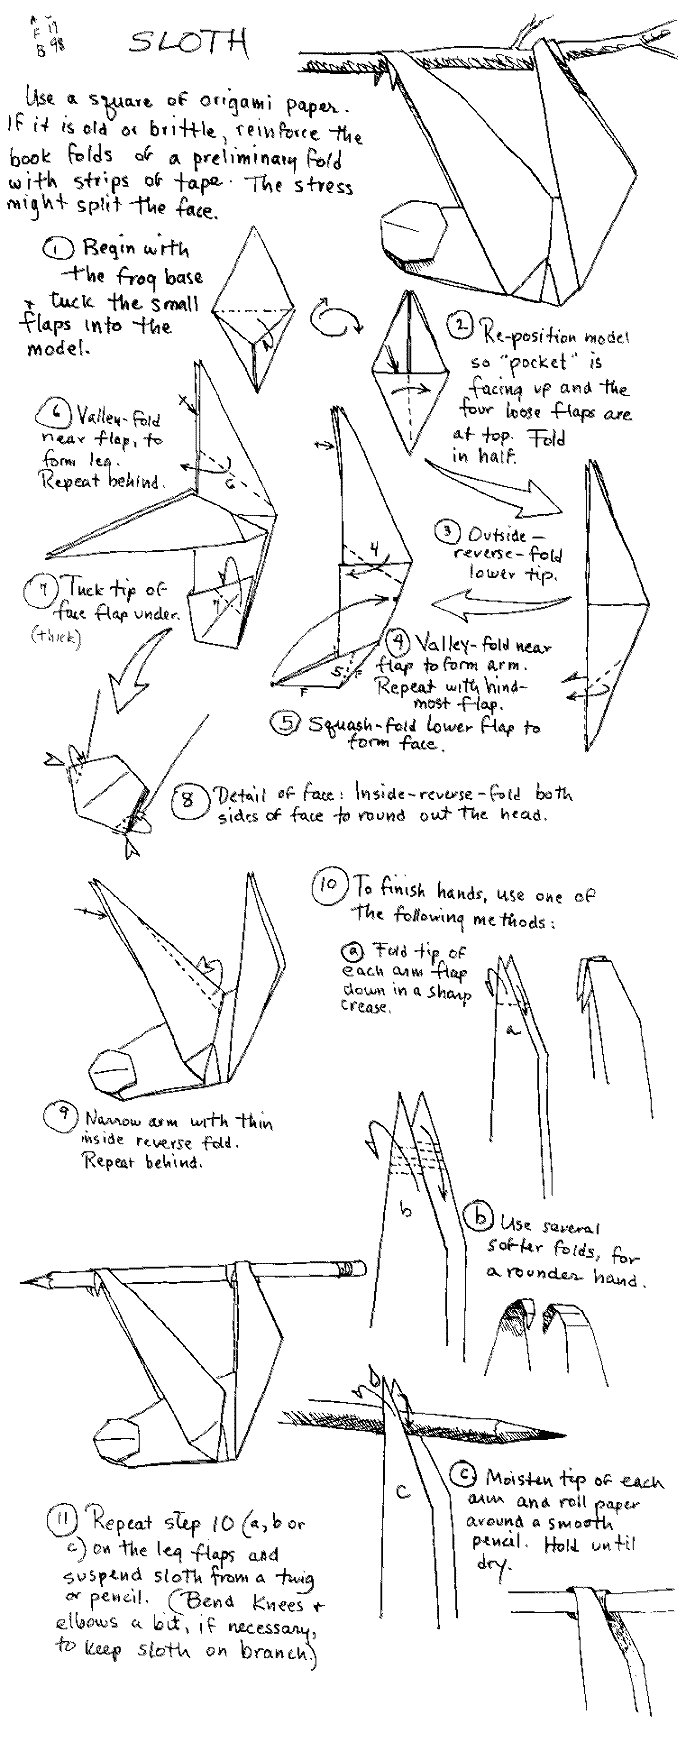 My origami sloth